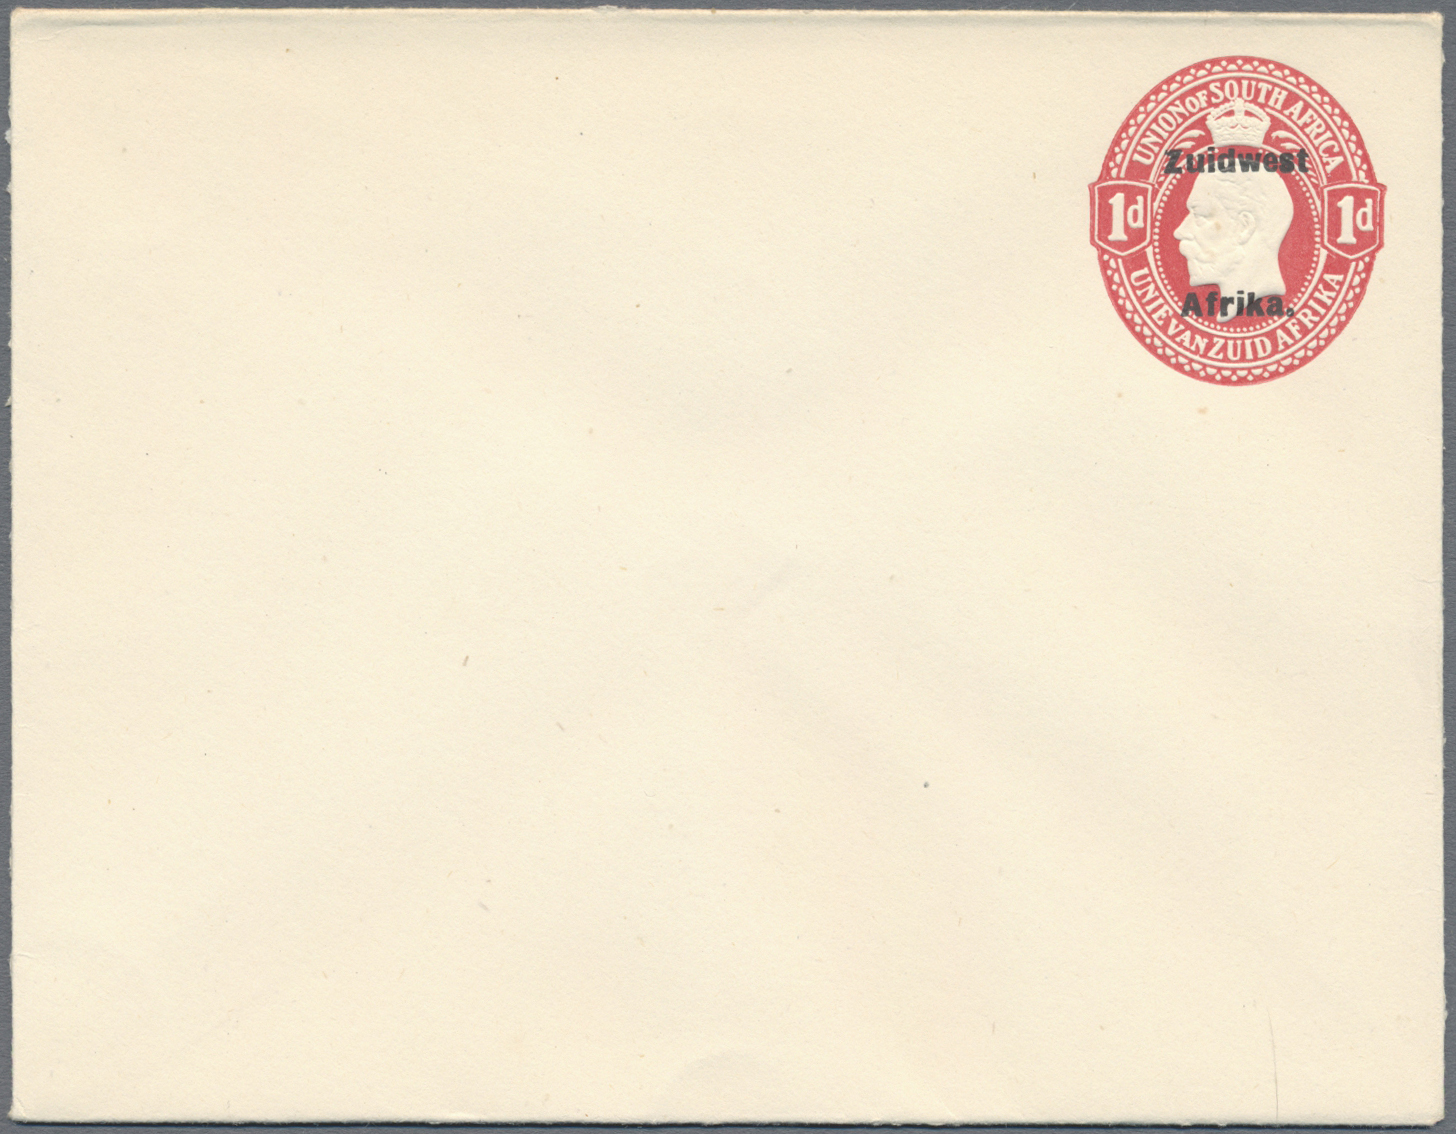 Lot 14558 - südwestafrika - ganzsachen  -  Auktionshaus Christoph Gärtner GmbH & Co. KG Sale #48 collections Overseas  Airmail / Ship mail & Thematics